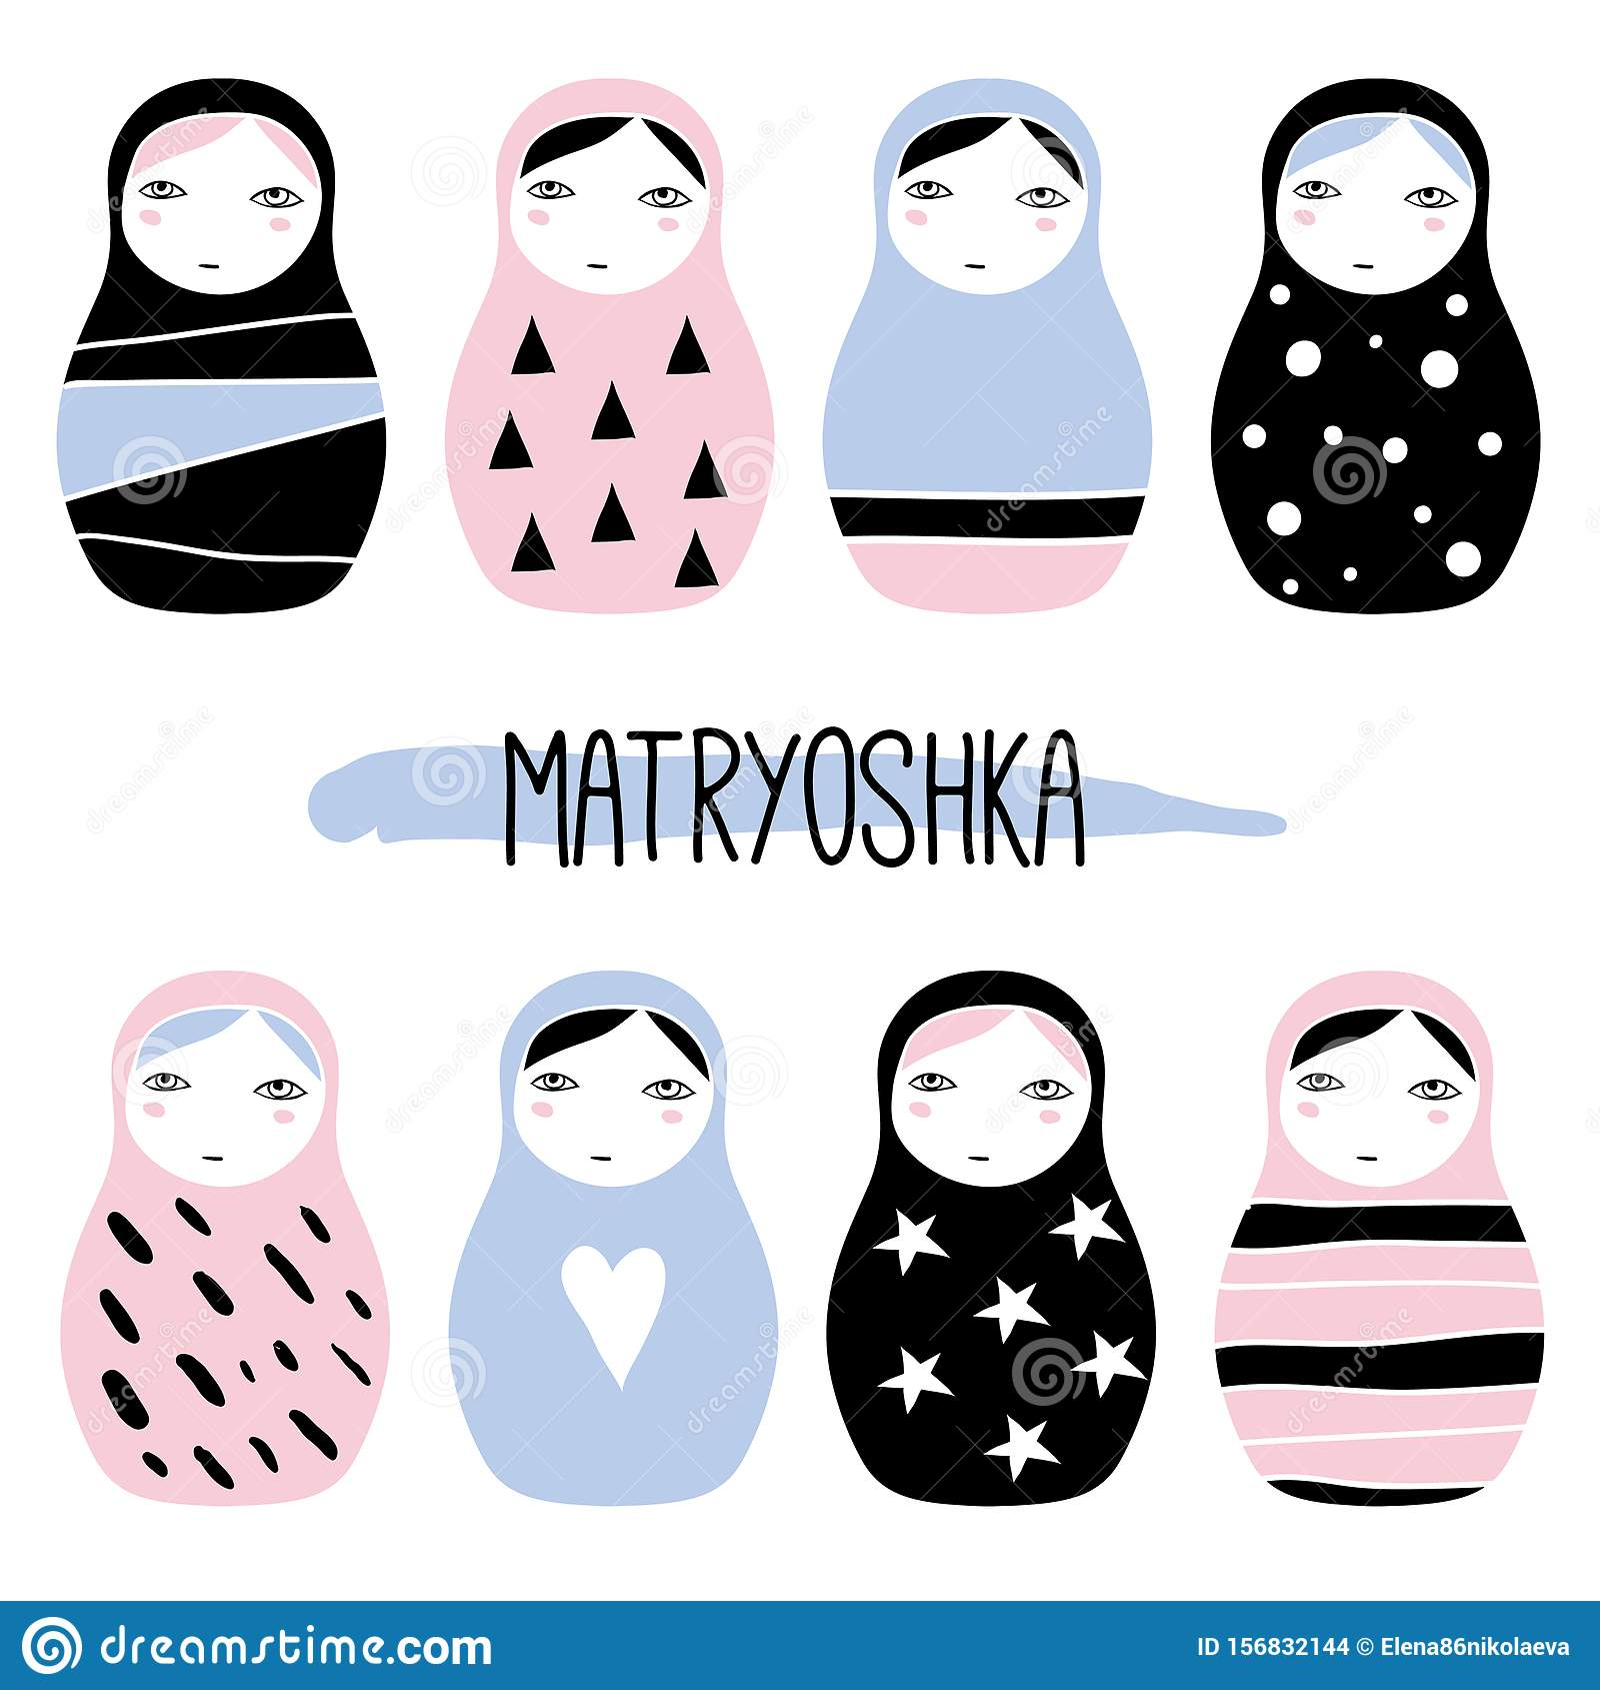 Matryoshka Doll clipart. Free download transparent .PNG   Creazilla